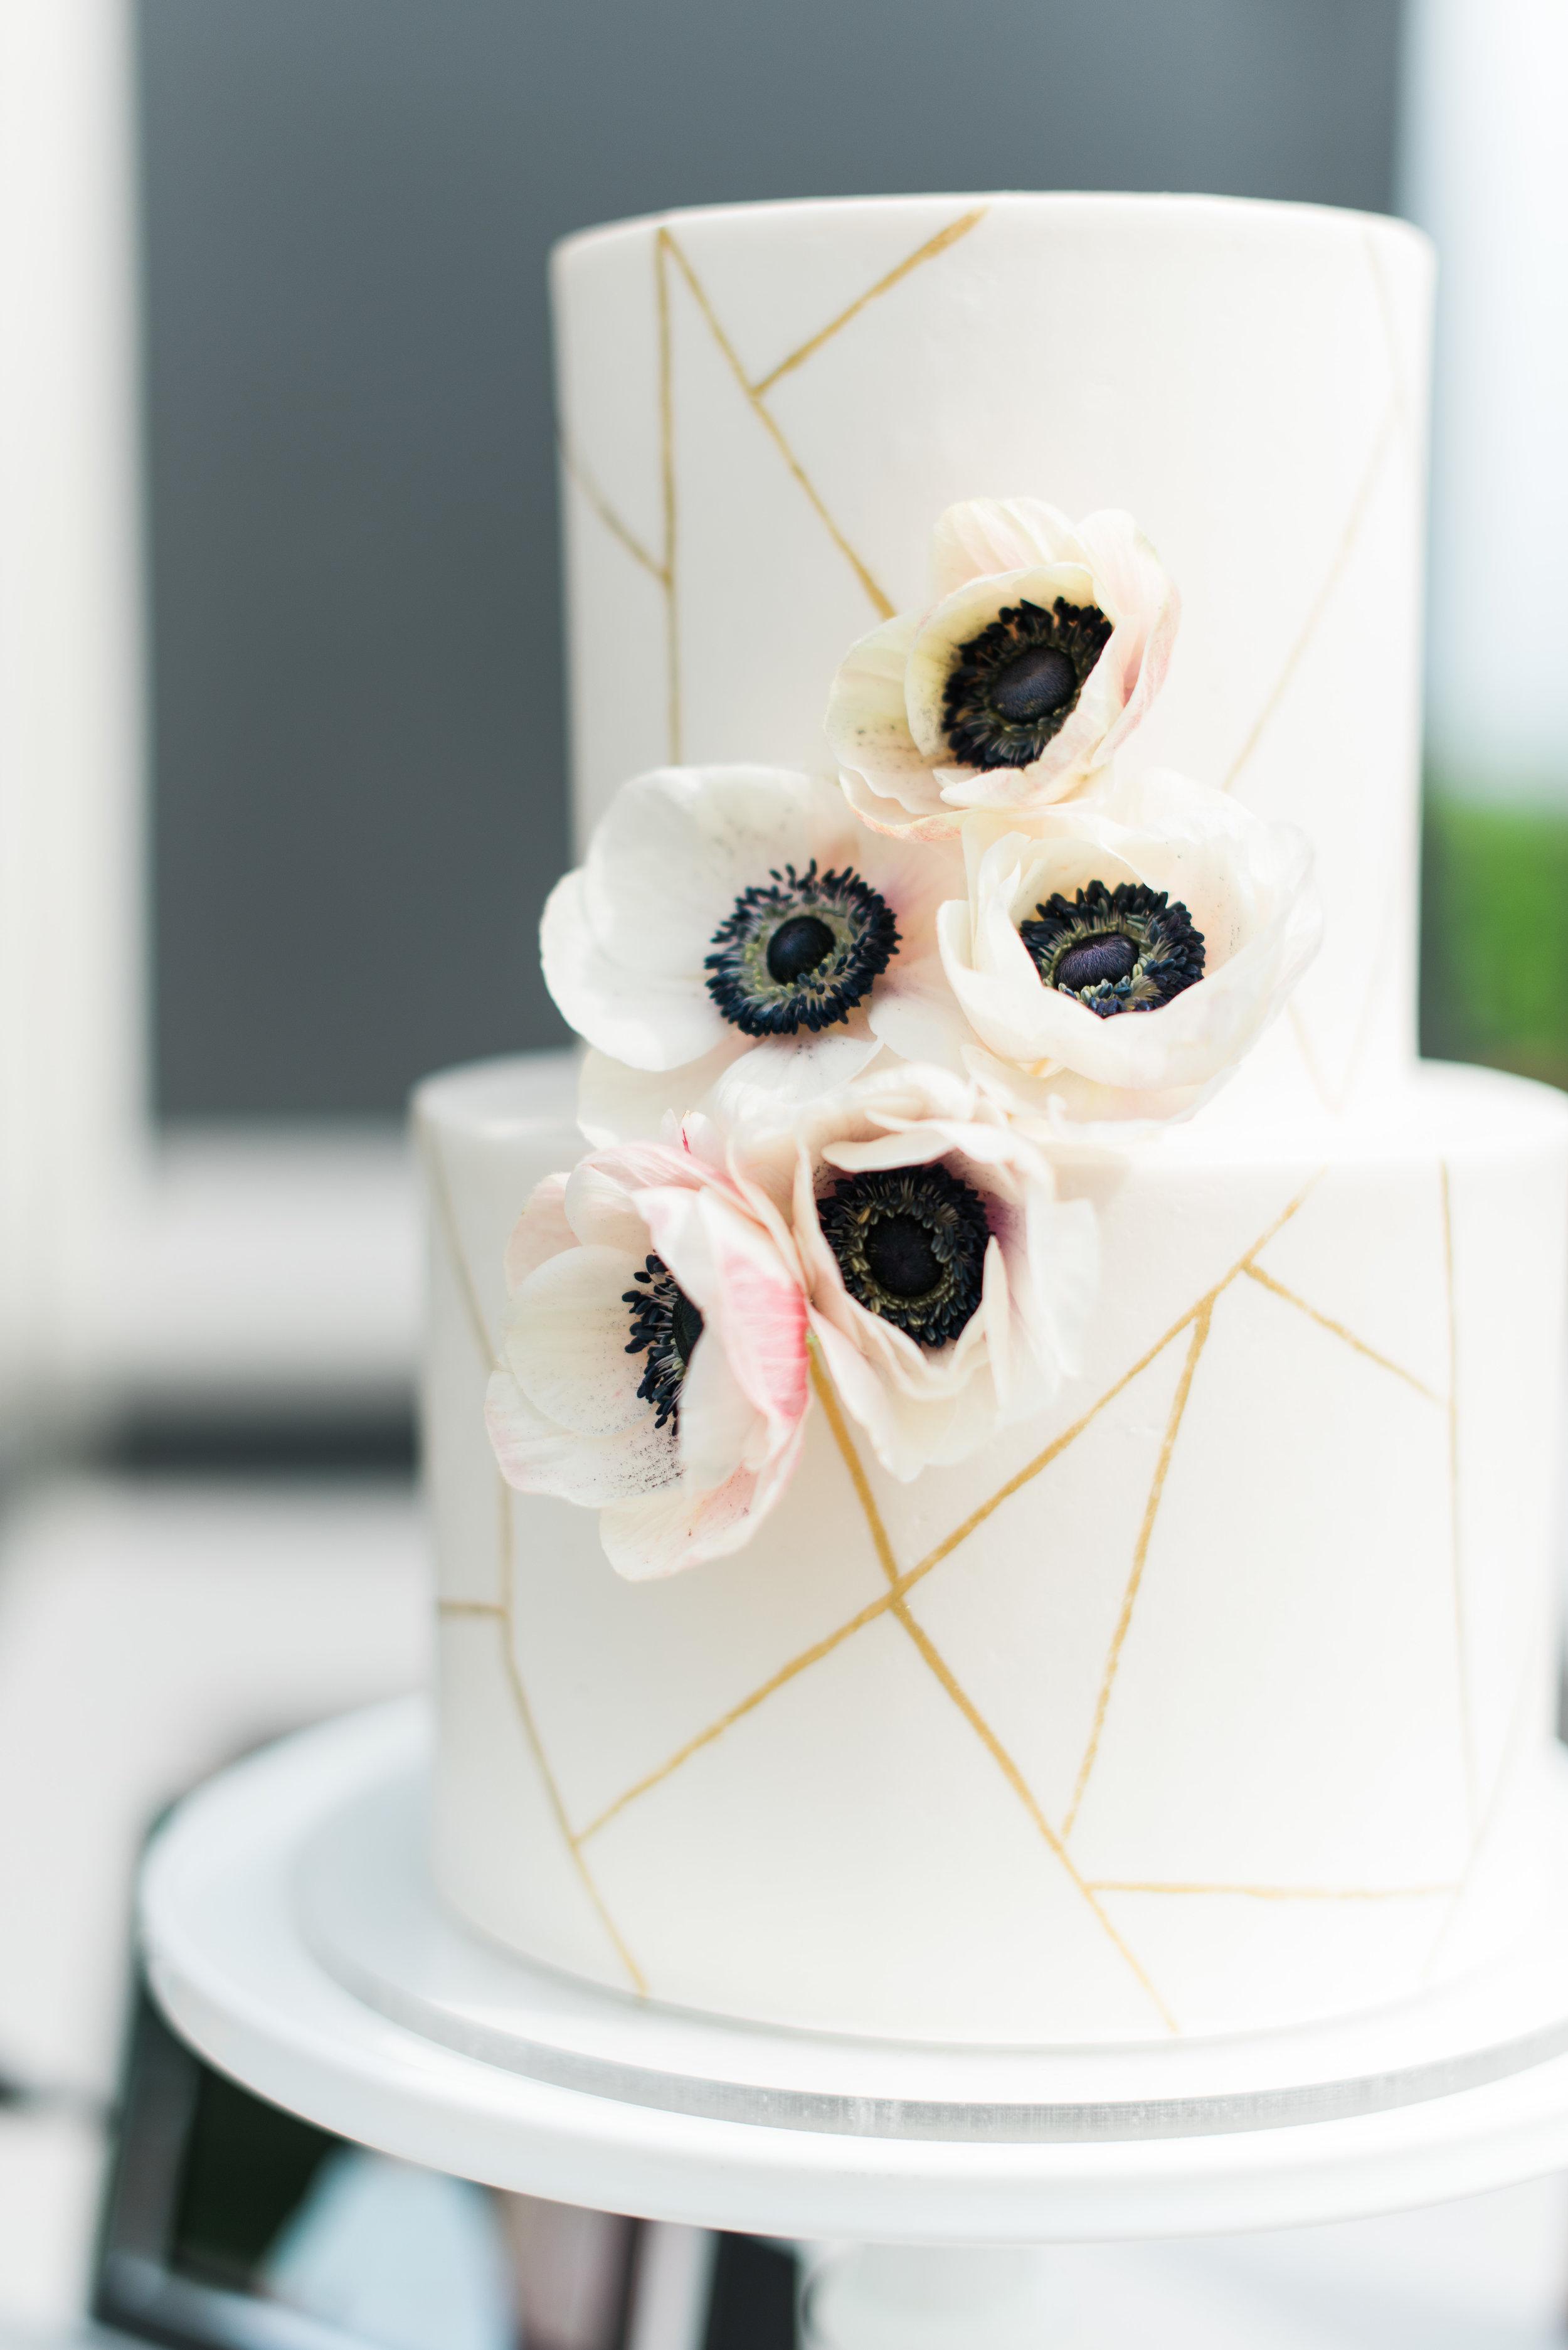 Bridalbliss.com | Portland Wedding | Oregon Event Planning and Design | Deyla Huss Photography |